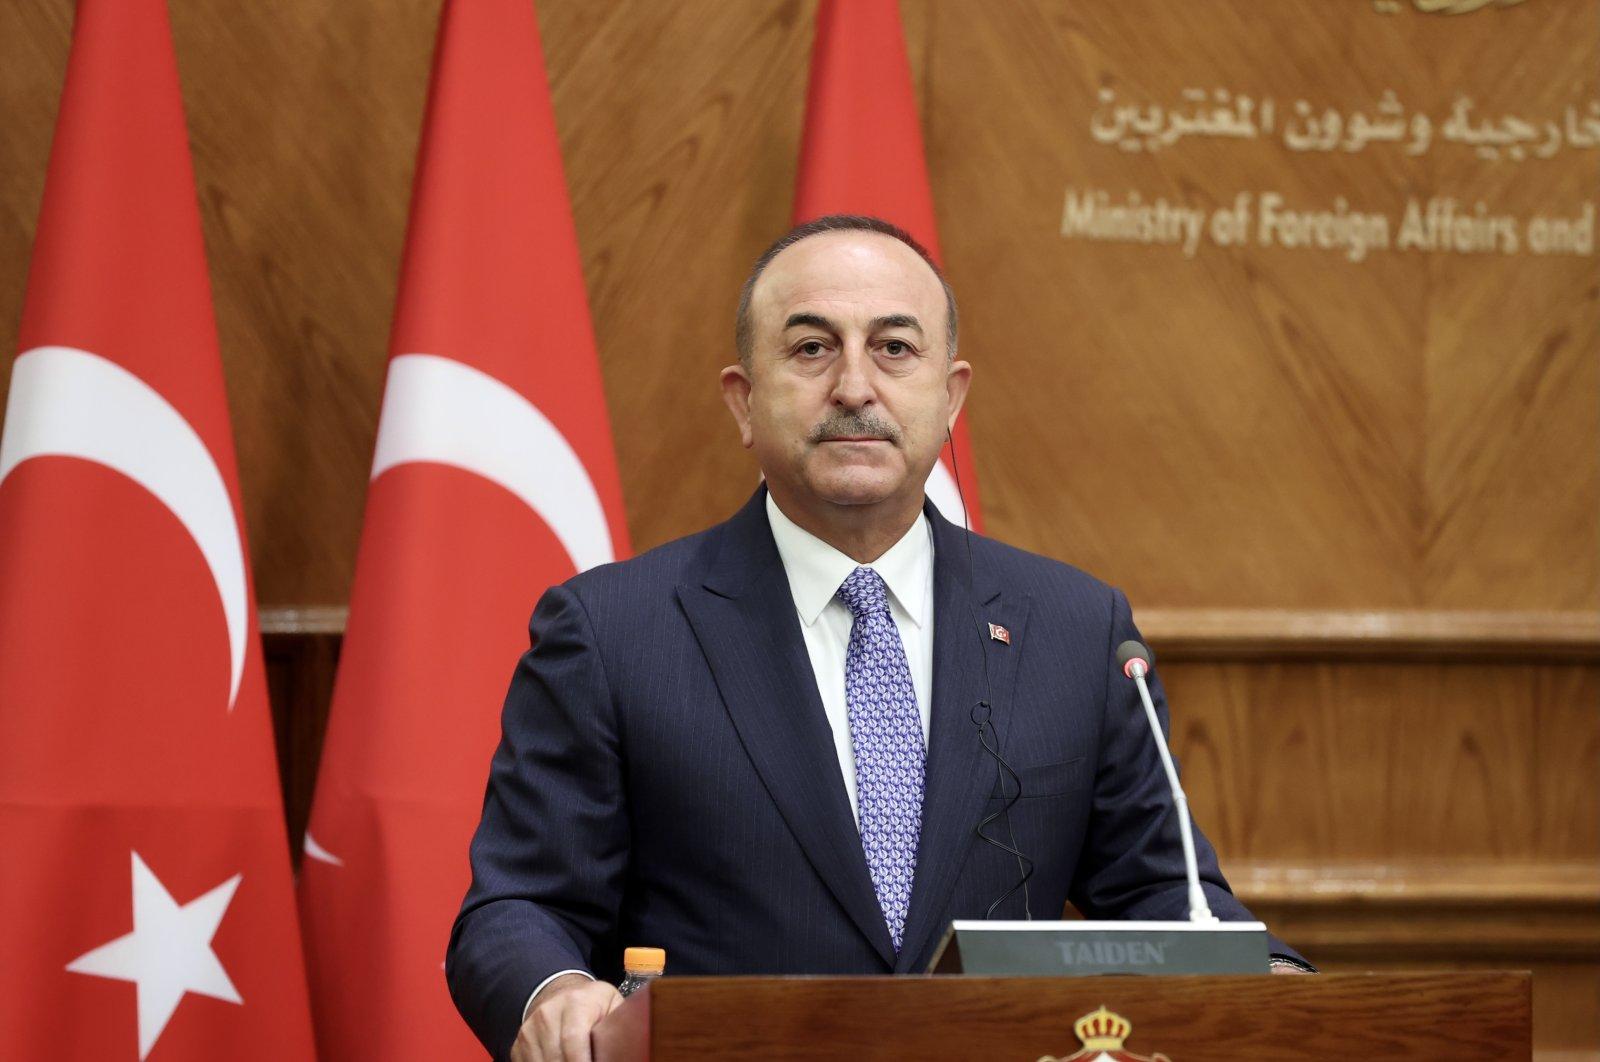 Foreign Minister Mevlüt Çavuşoğlu during a press conference in Jordan, Aug. 17, 2021 (AA Photo)